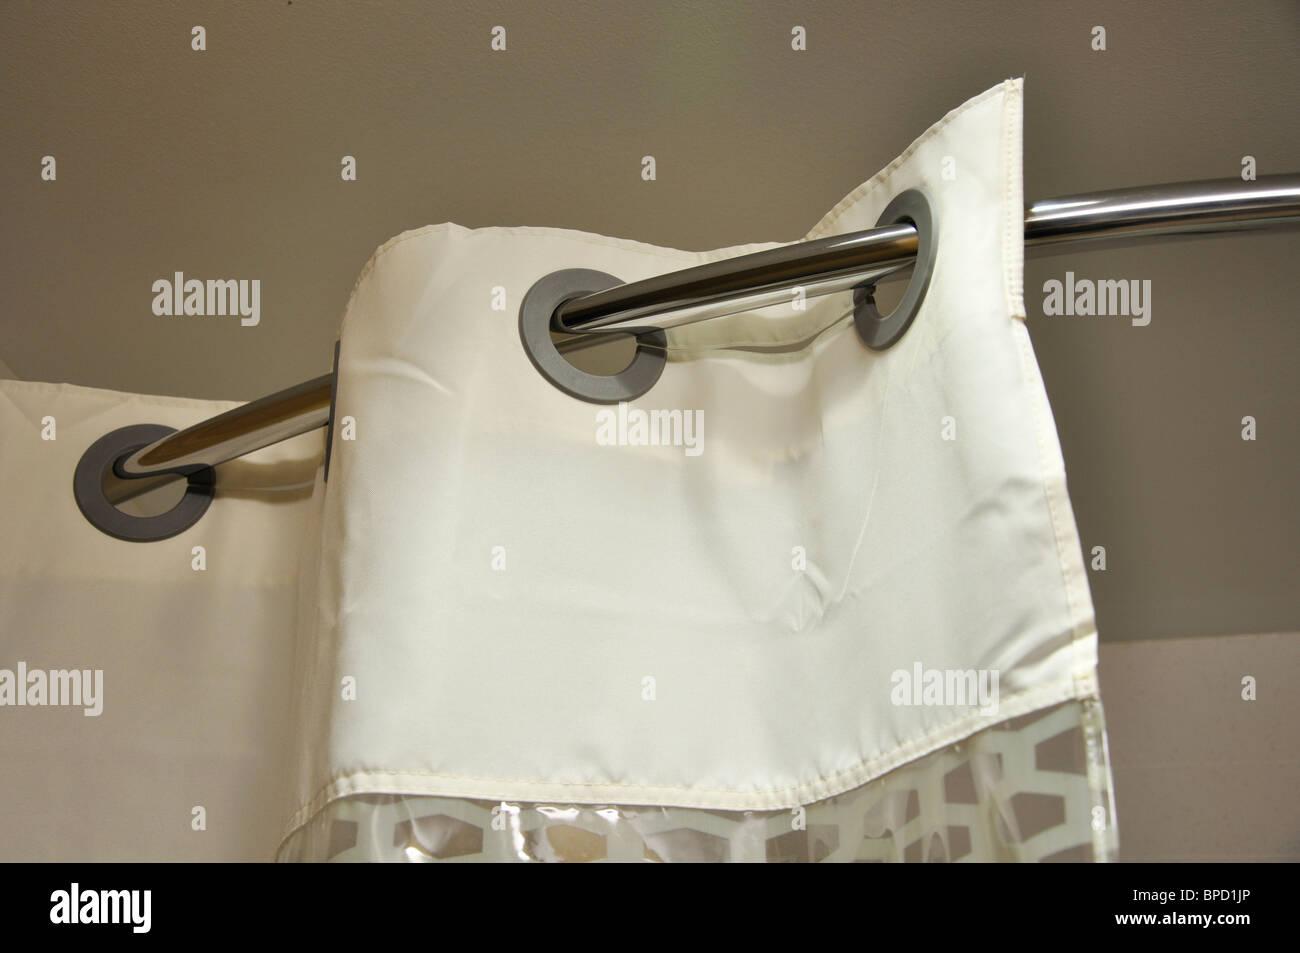 Hampton Inn Hotel Bathroom Shower Curtain